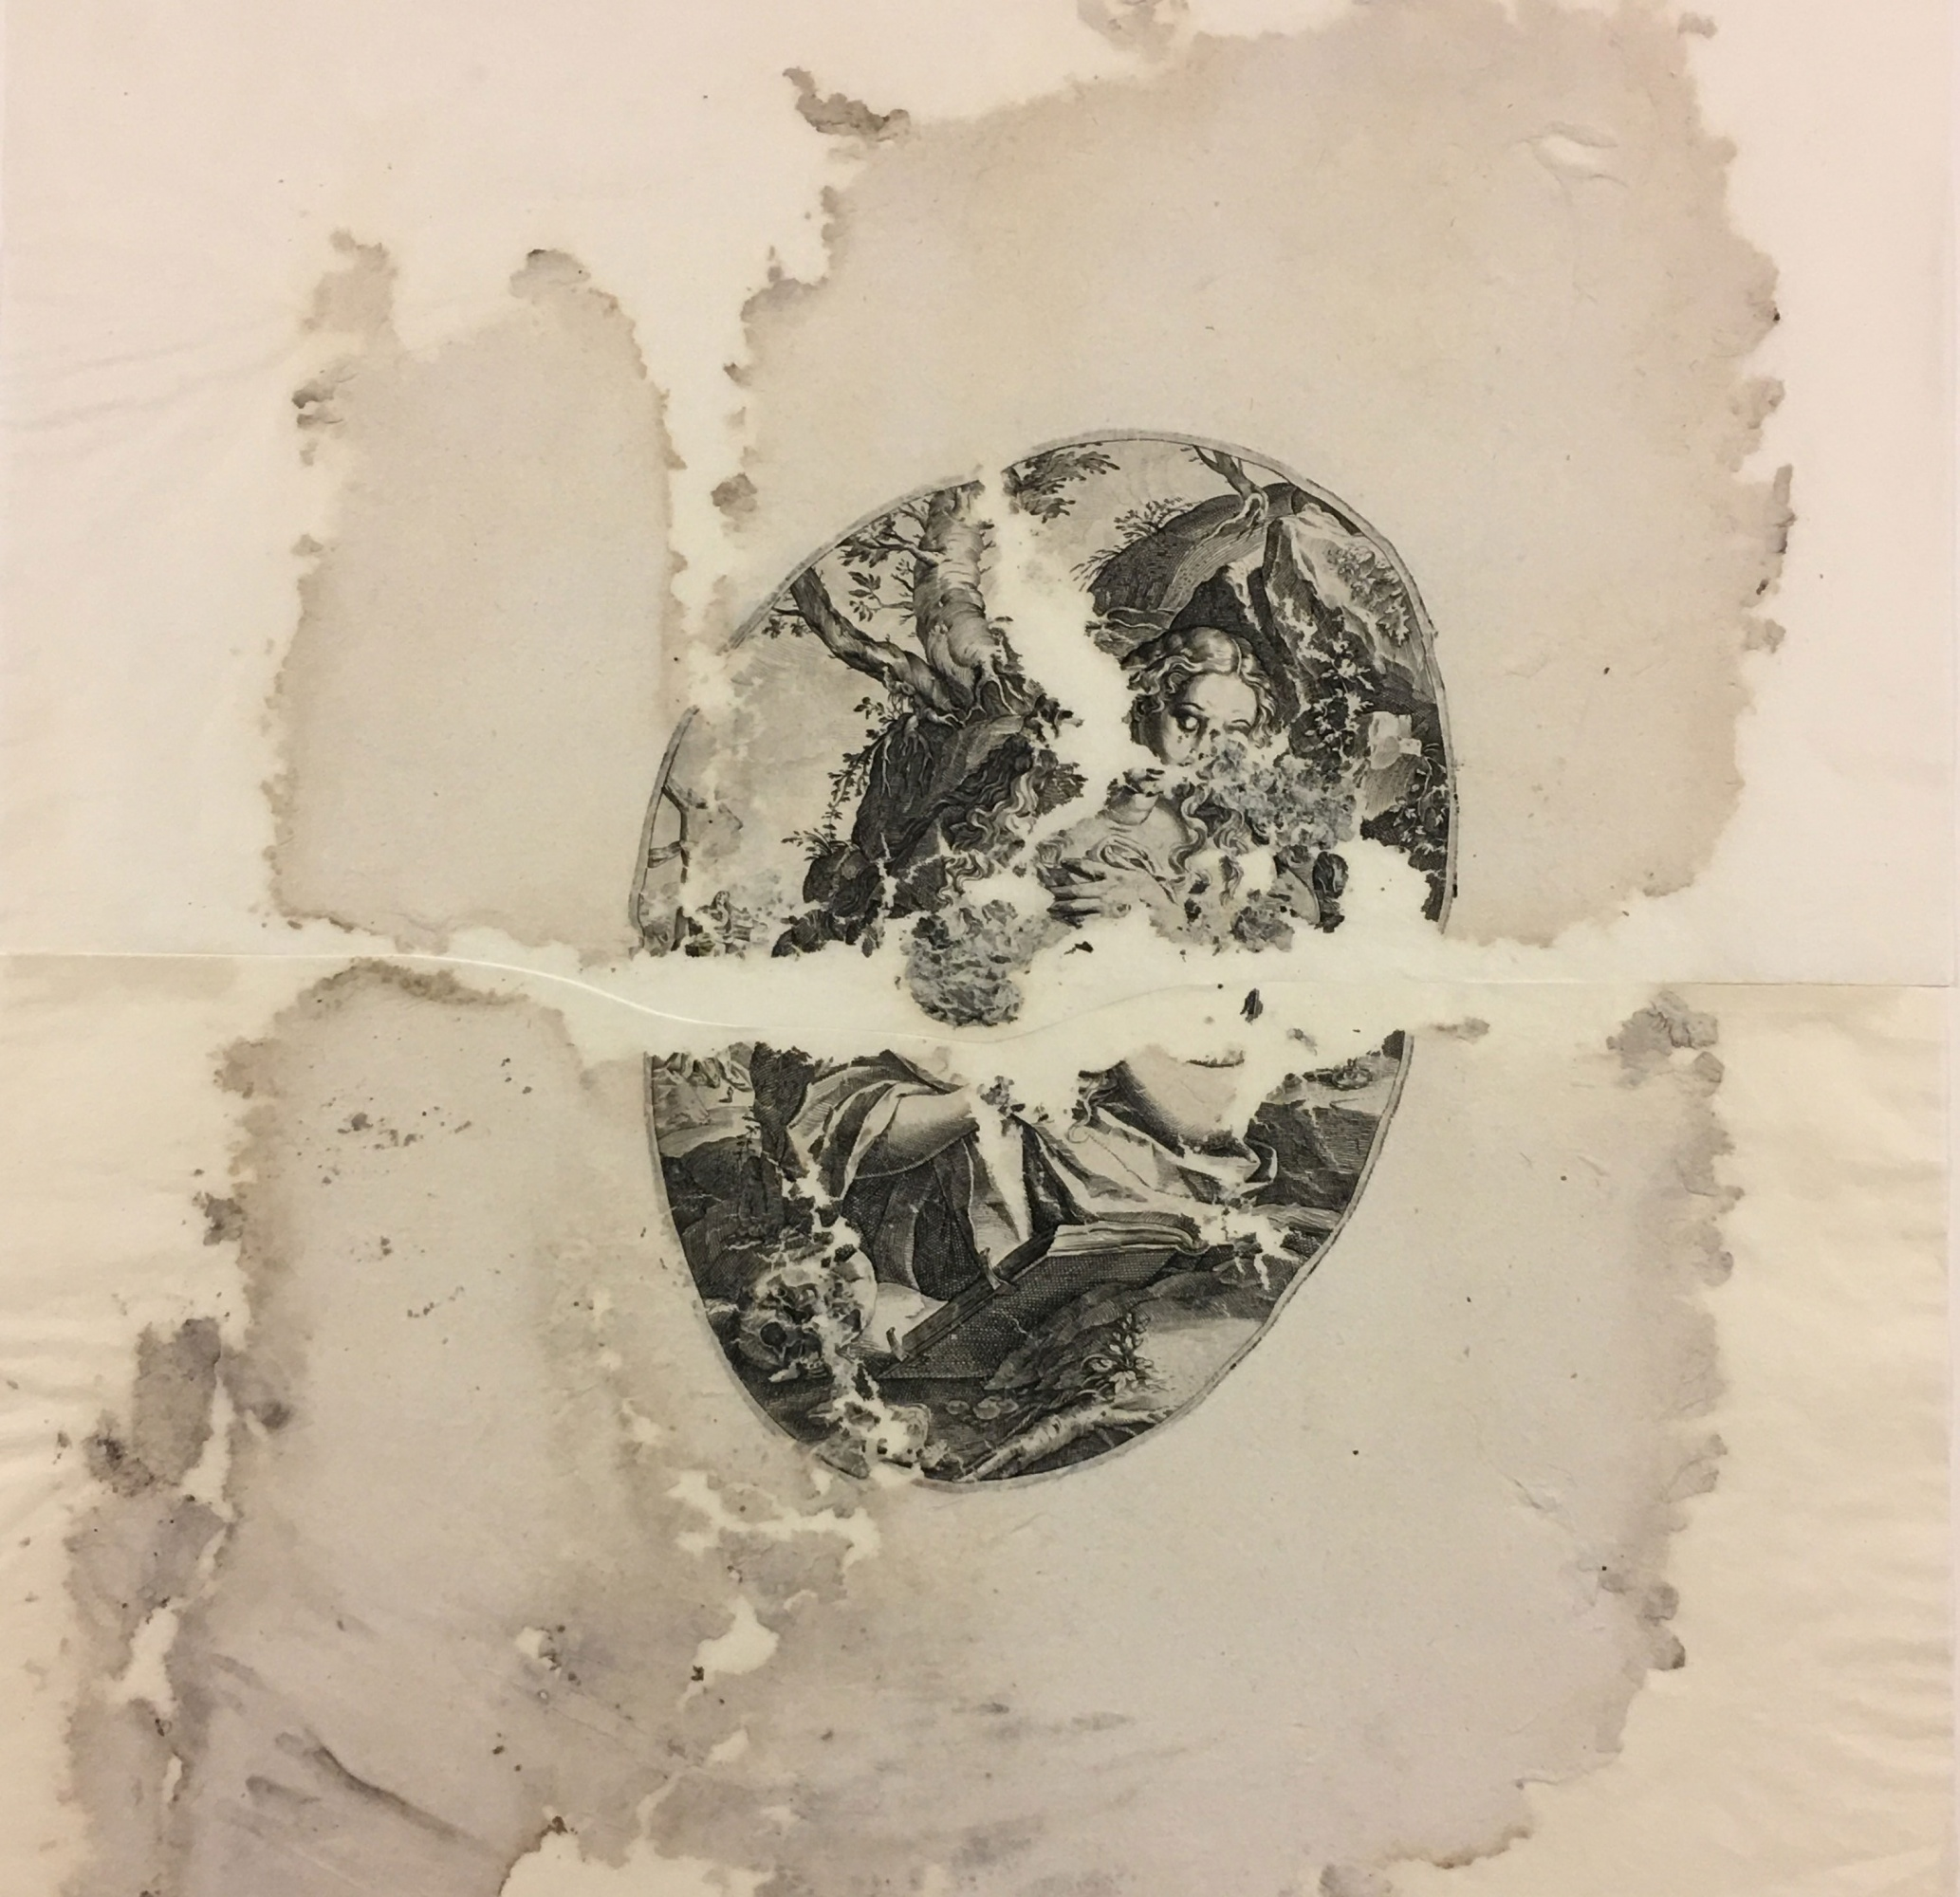 Artic ink poster